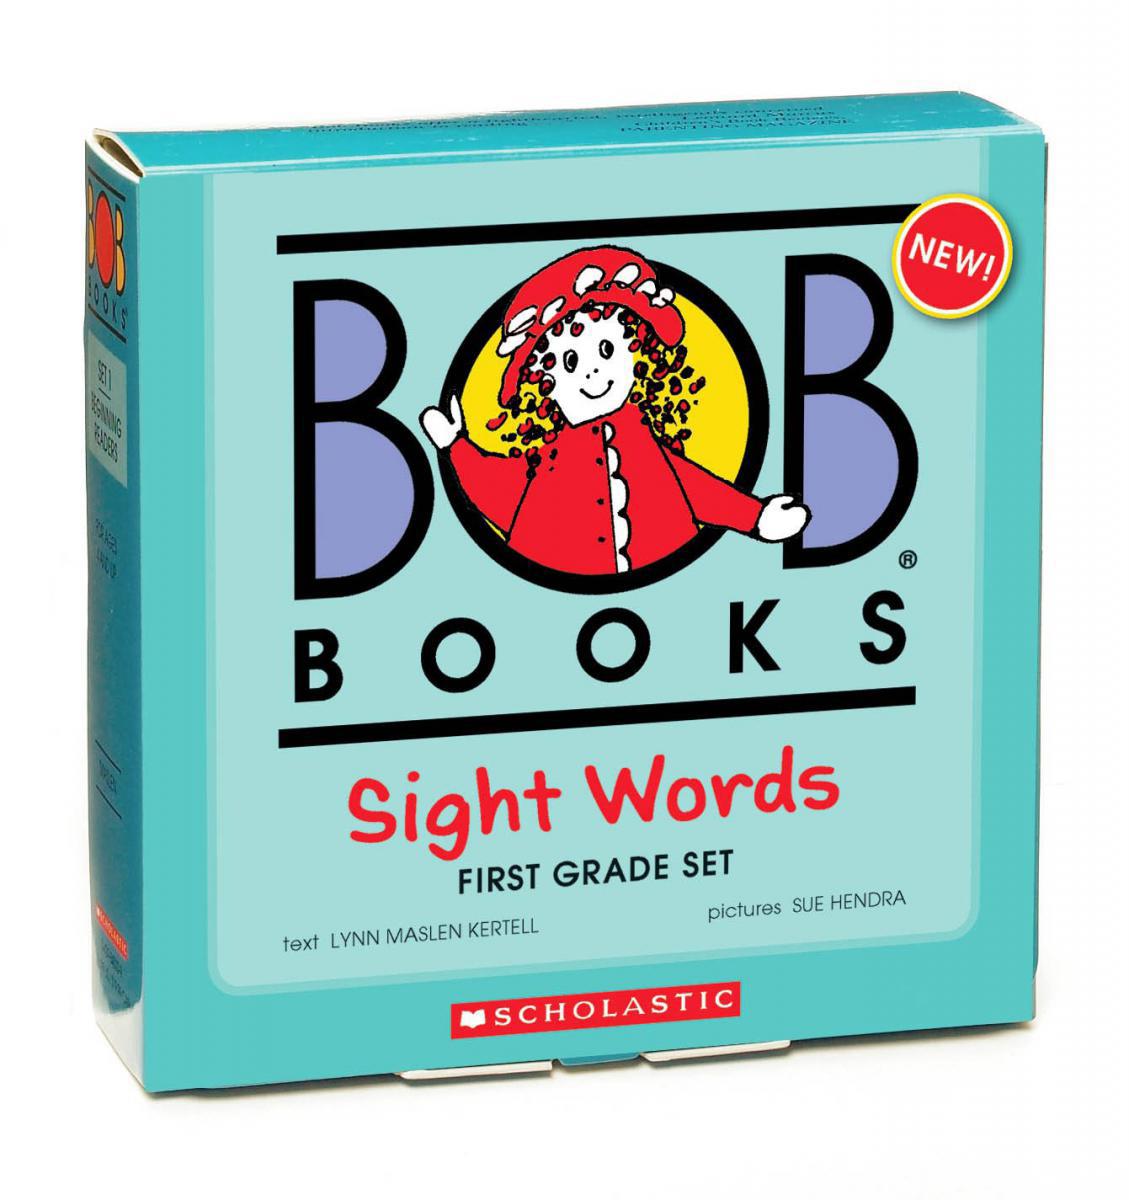 BOB Books®: Sight Words First Grade Set